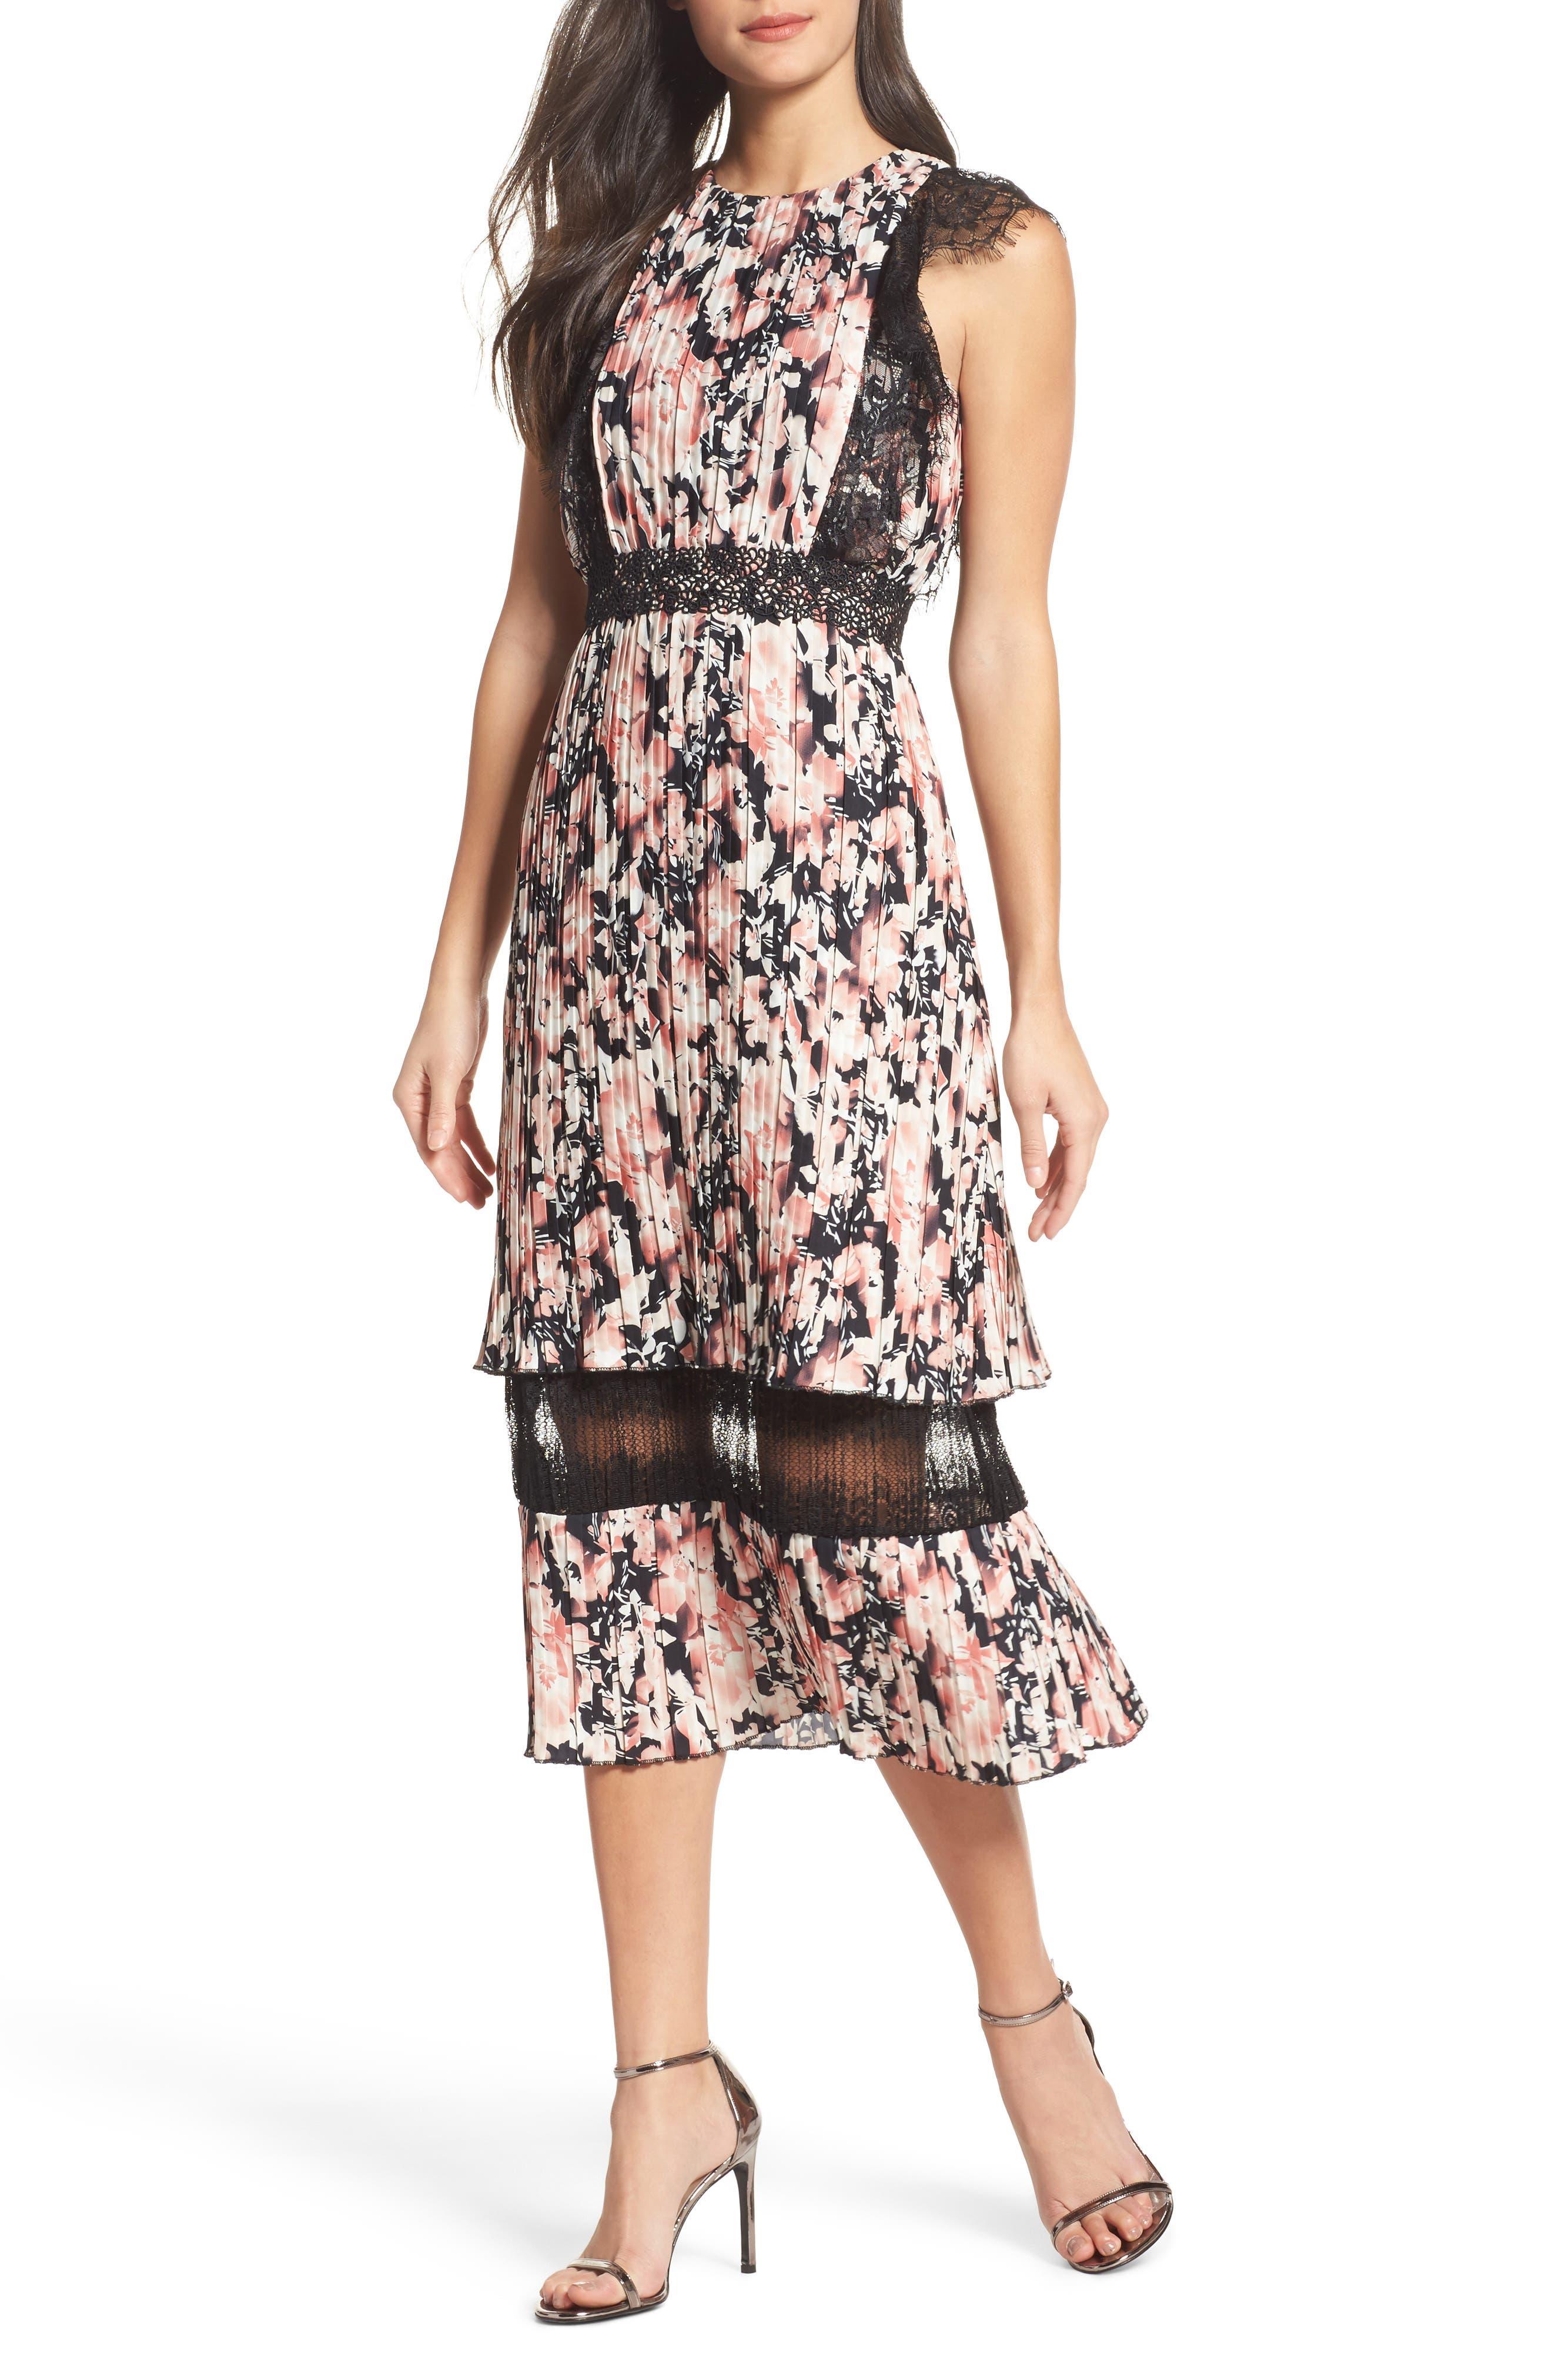 Alternate Image 1 Selected - Foxiedox Jasmine Lace Trim Pleated Floral Midi Dress